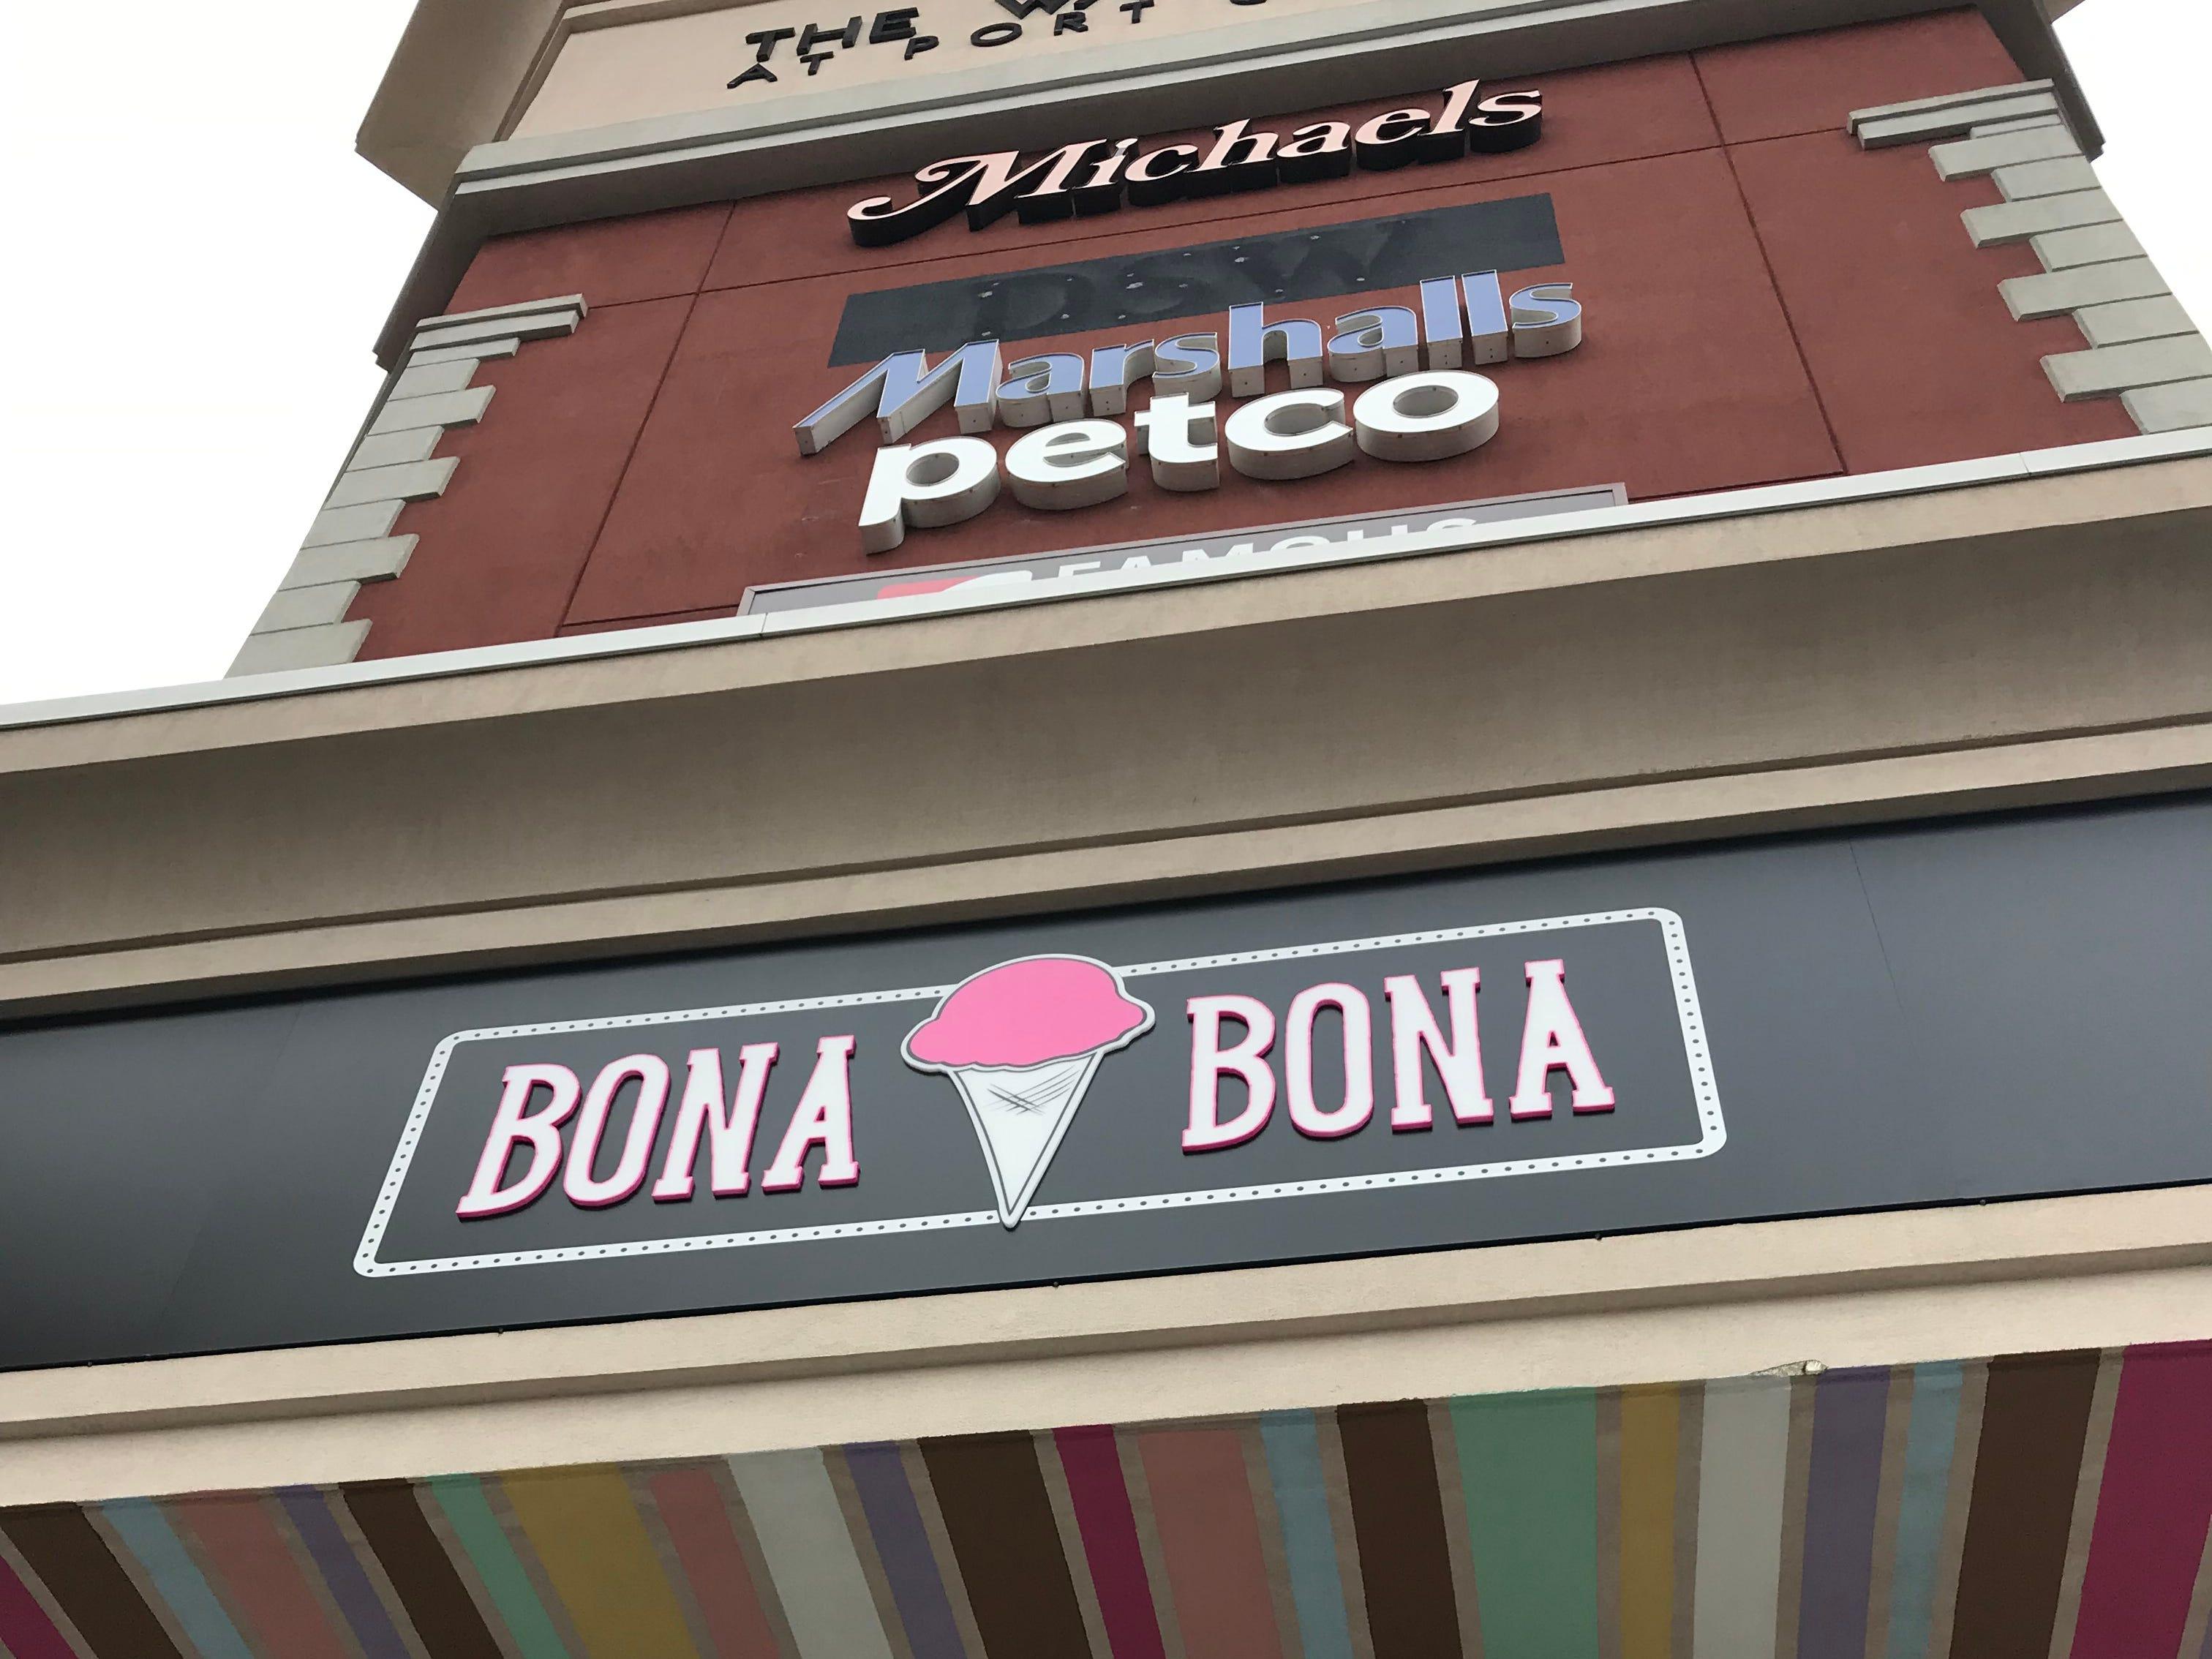 The Bona Bona signage in Port Chester.